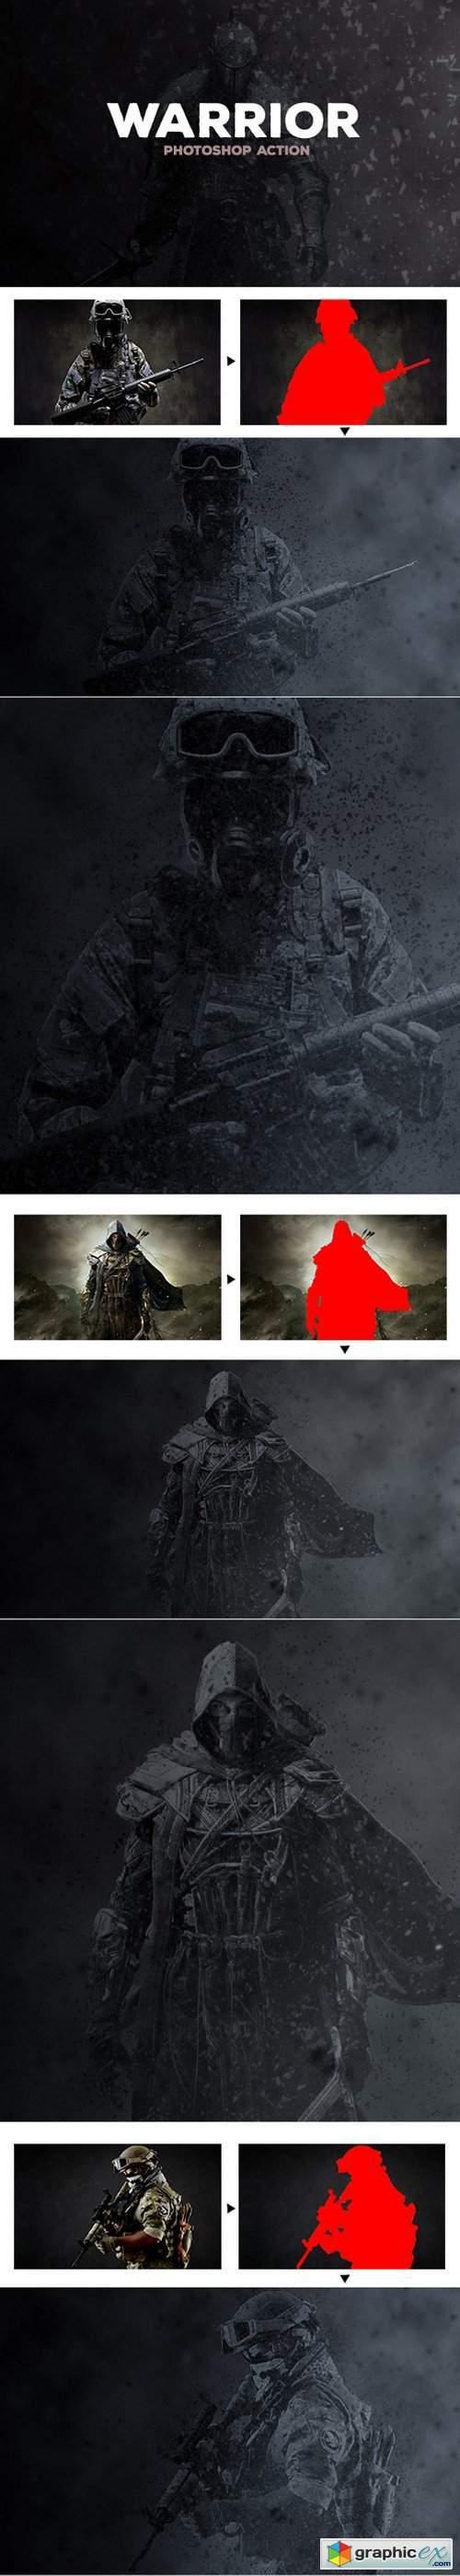 Warrior - Photoshop Action #38